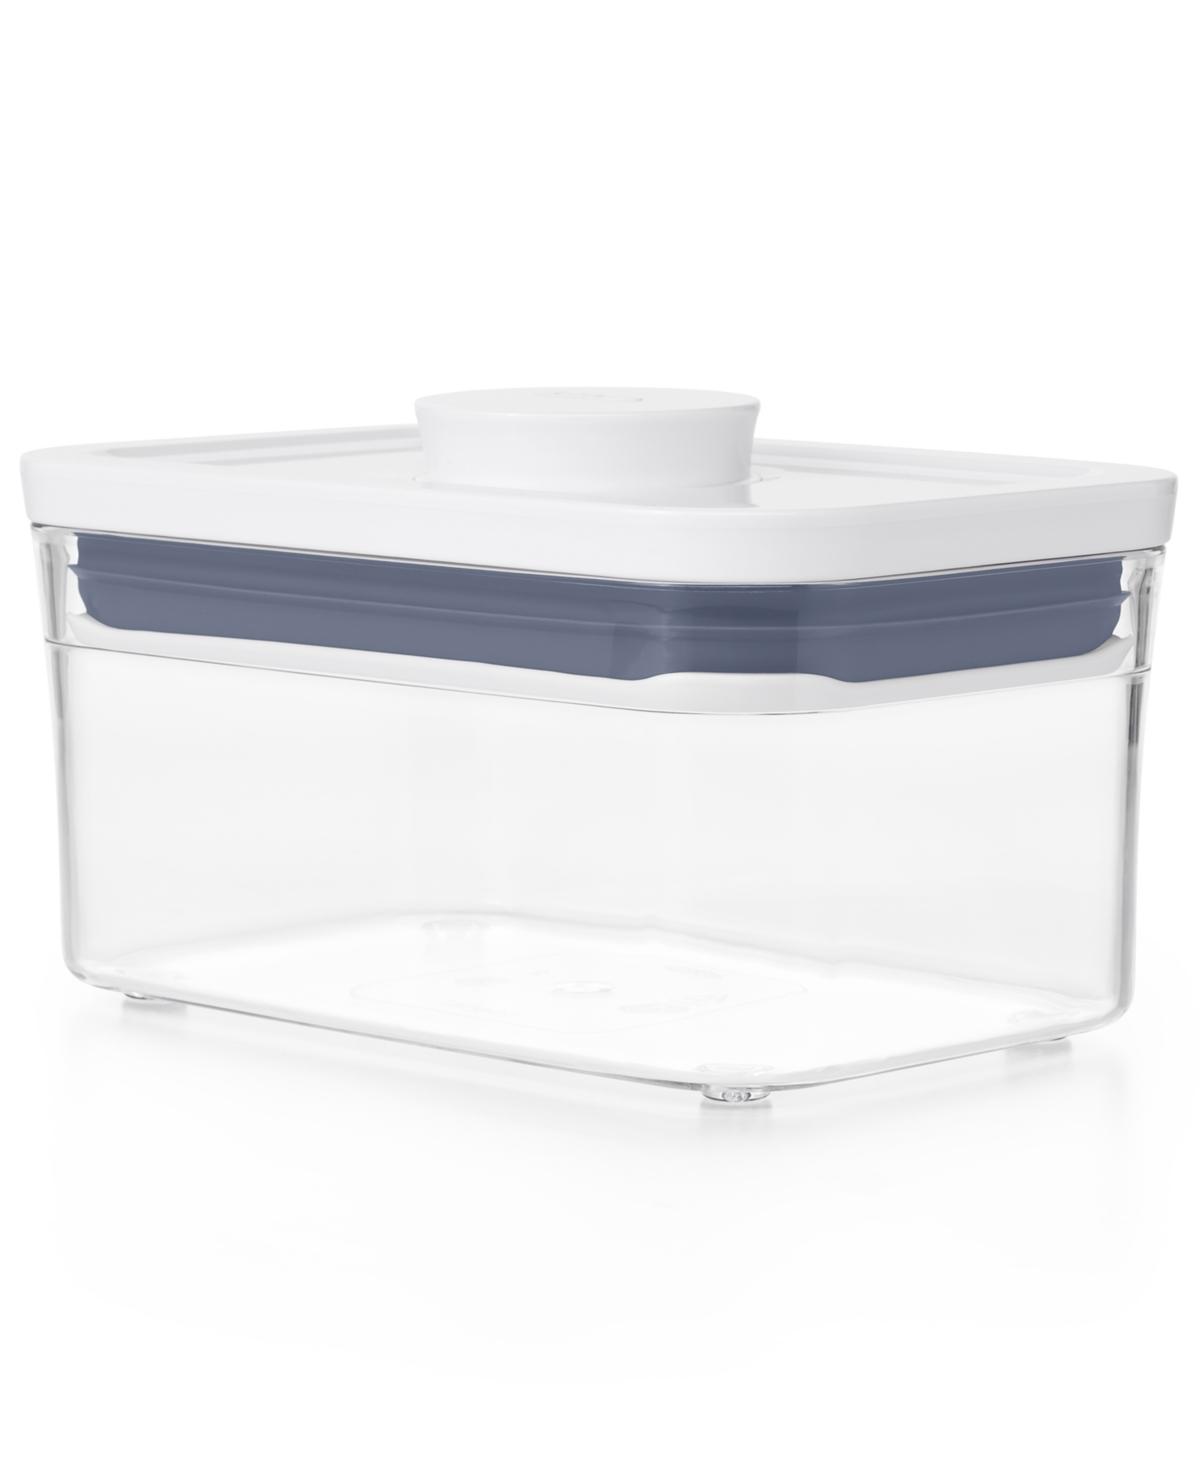 Oxo Pop Mini Rectangular Food Storage Container